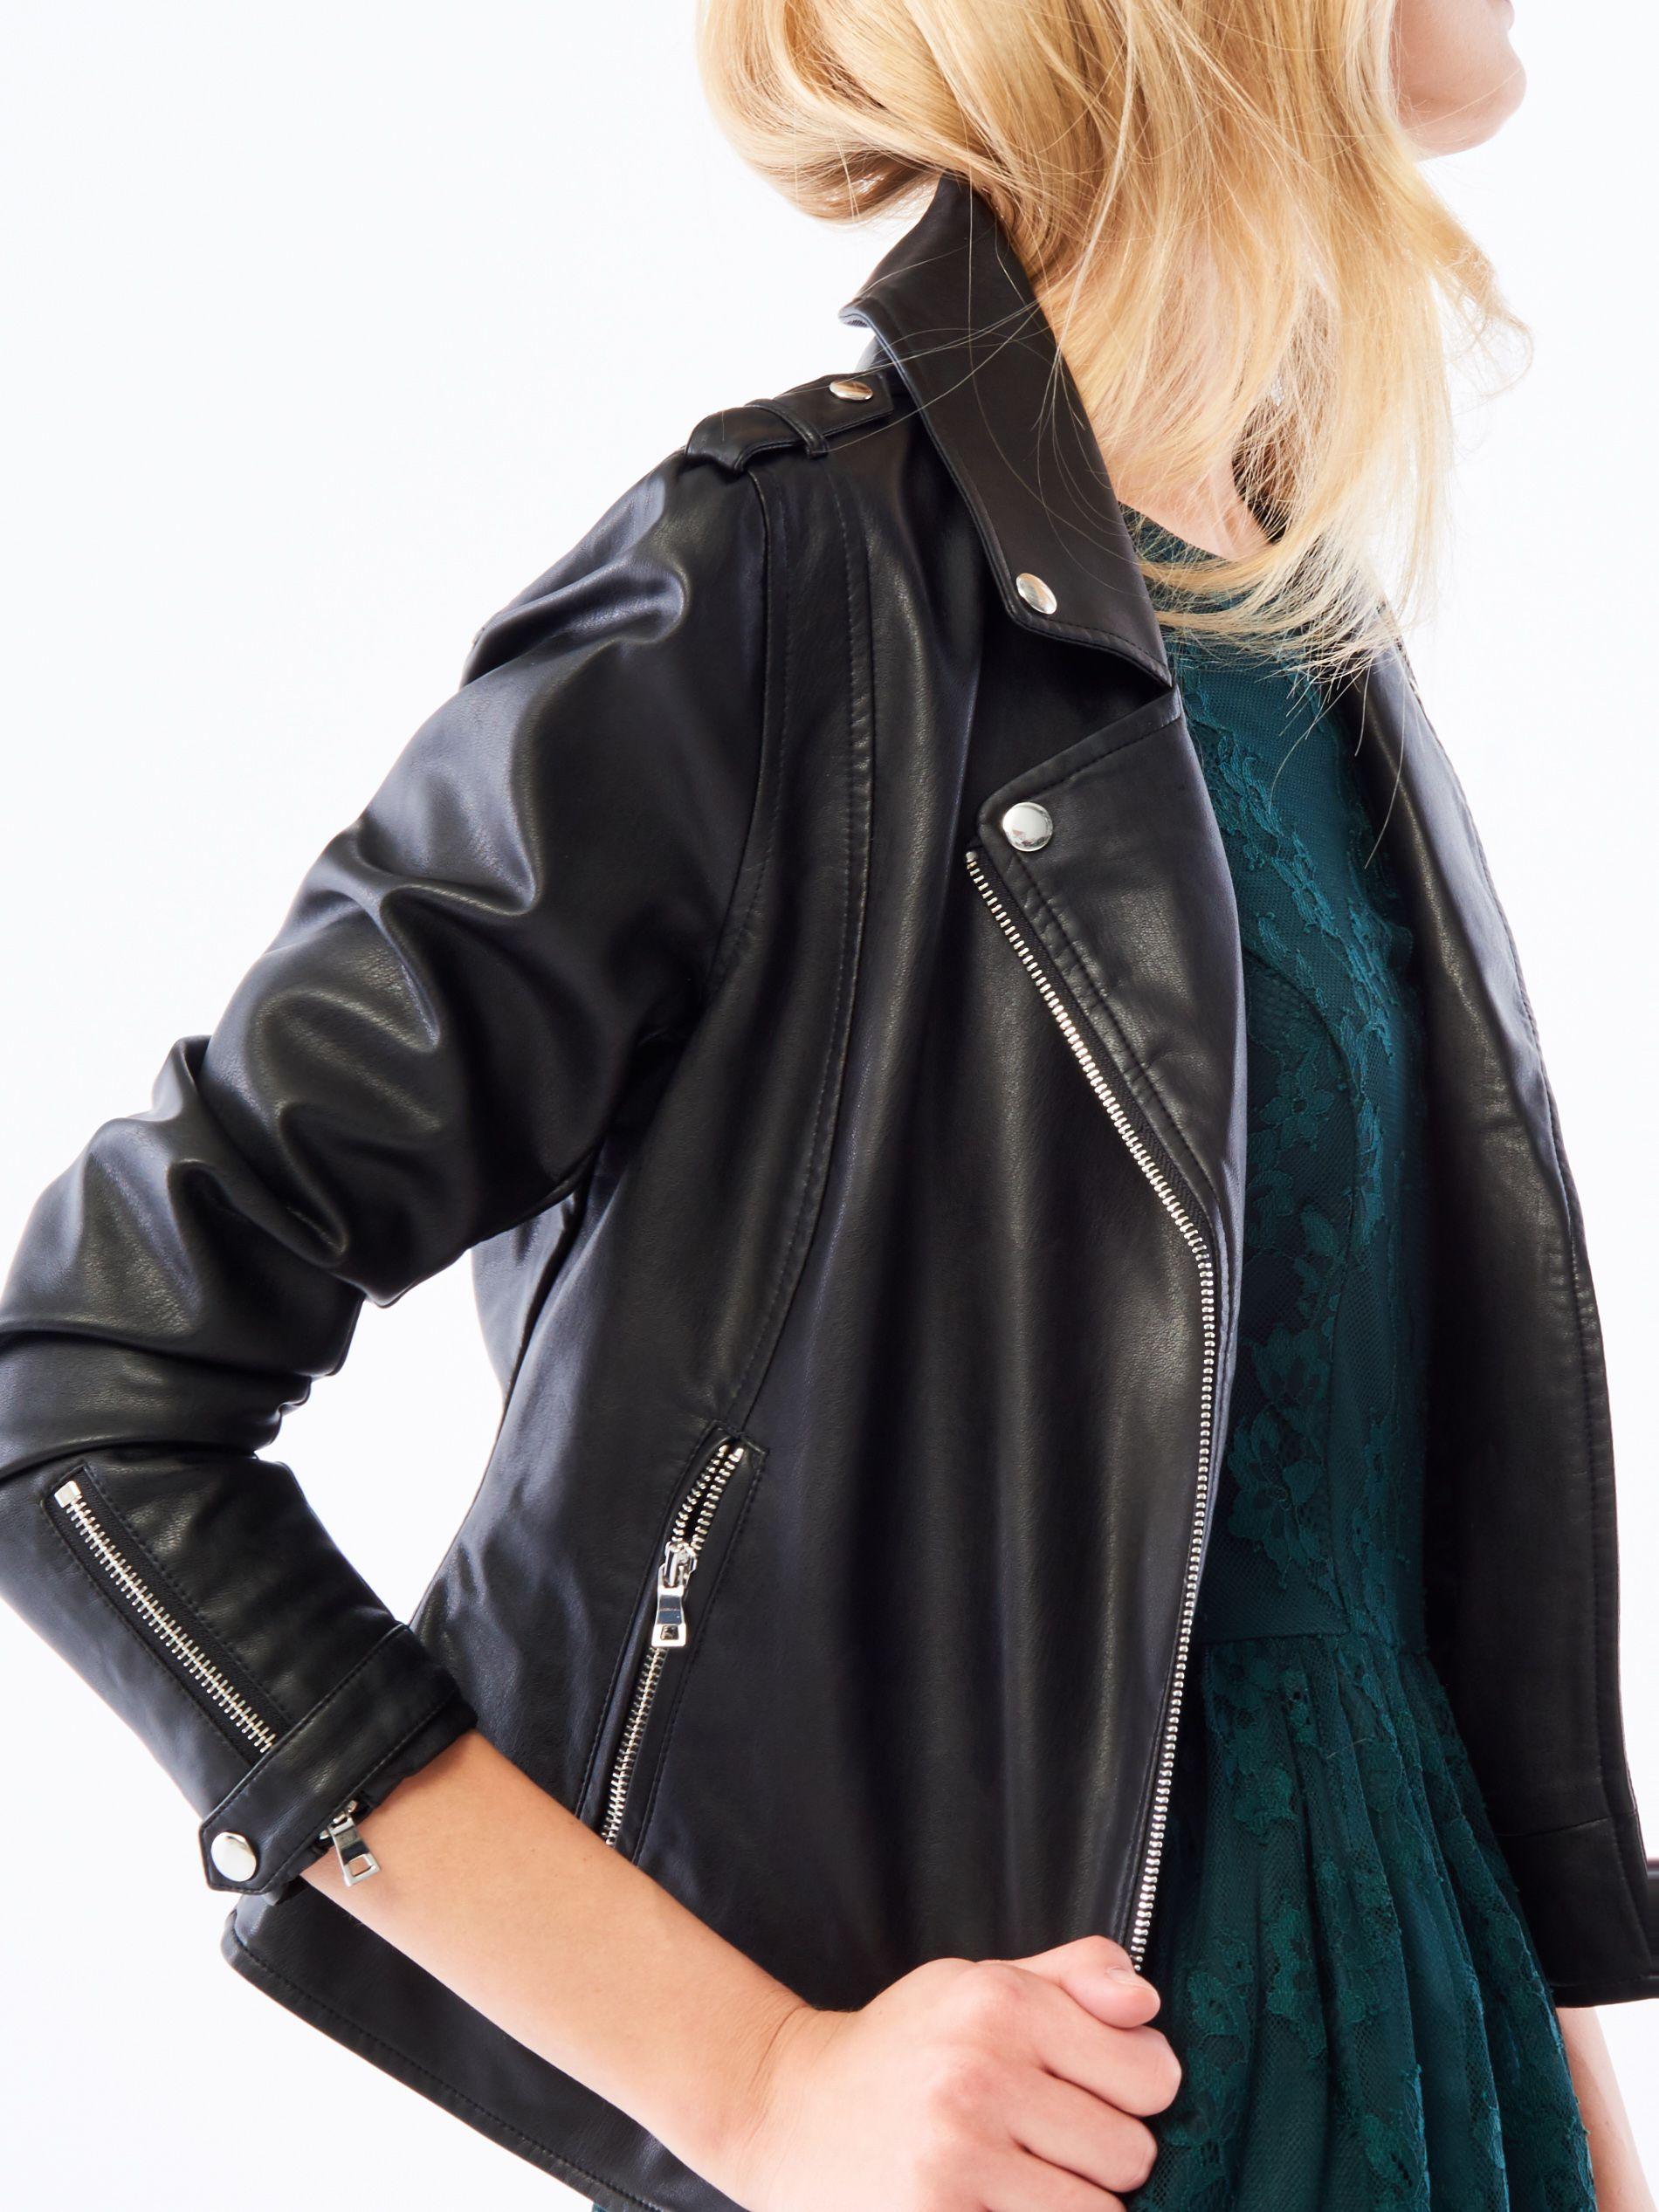 Ramaoneska After Hourse Bestsellers Czarny Mohito Fashion Leather Jacket Jackets